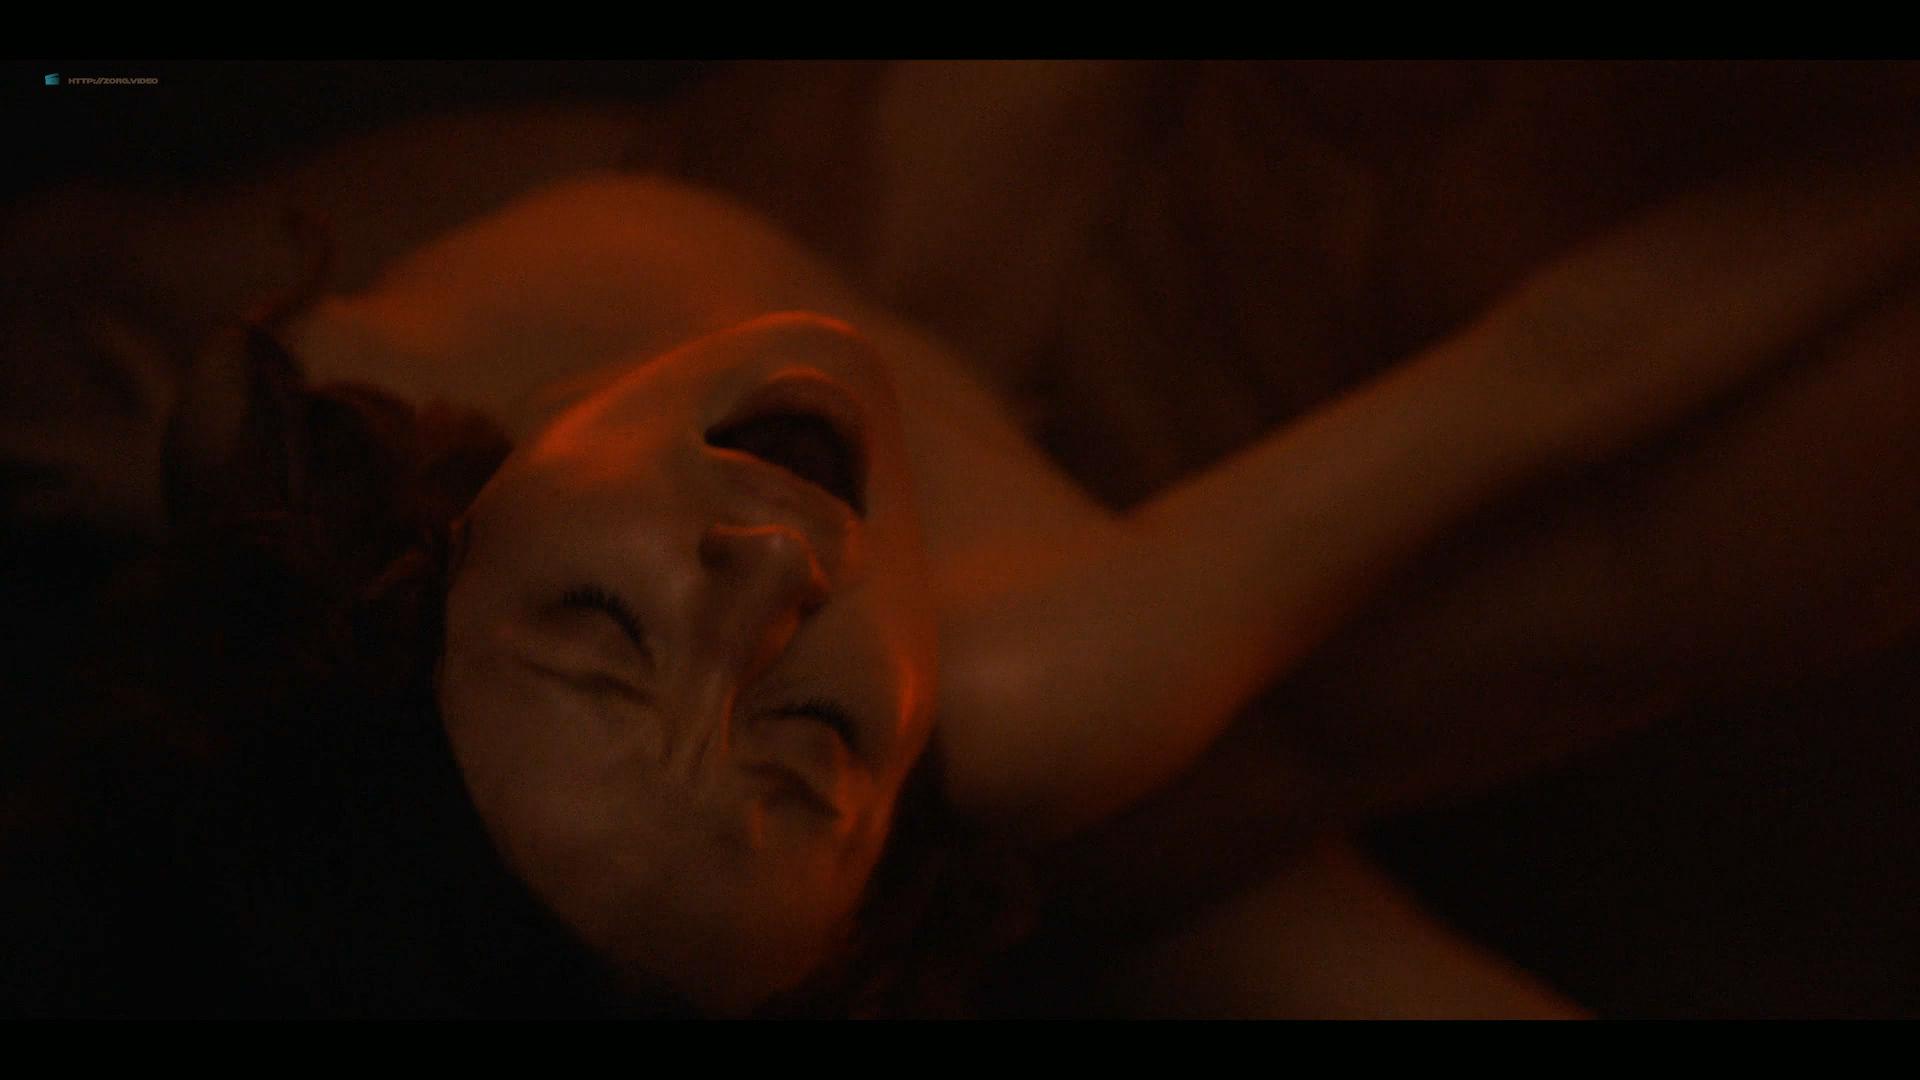 Emily Browning nude hot sex Hani Furstenberg nude sex too - American Gods (2019) s2e5 HD 1080p (5)